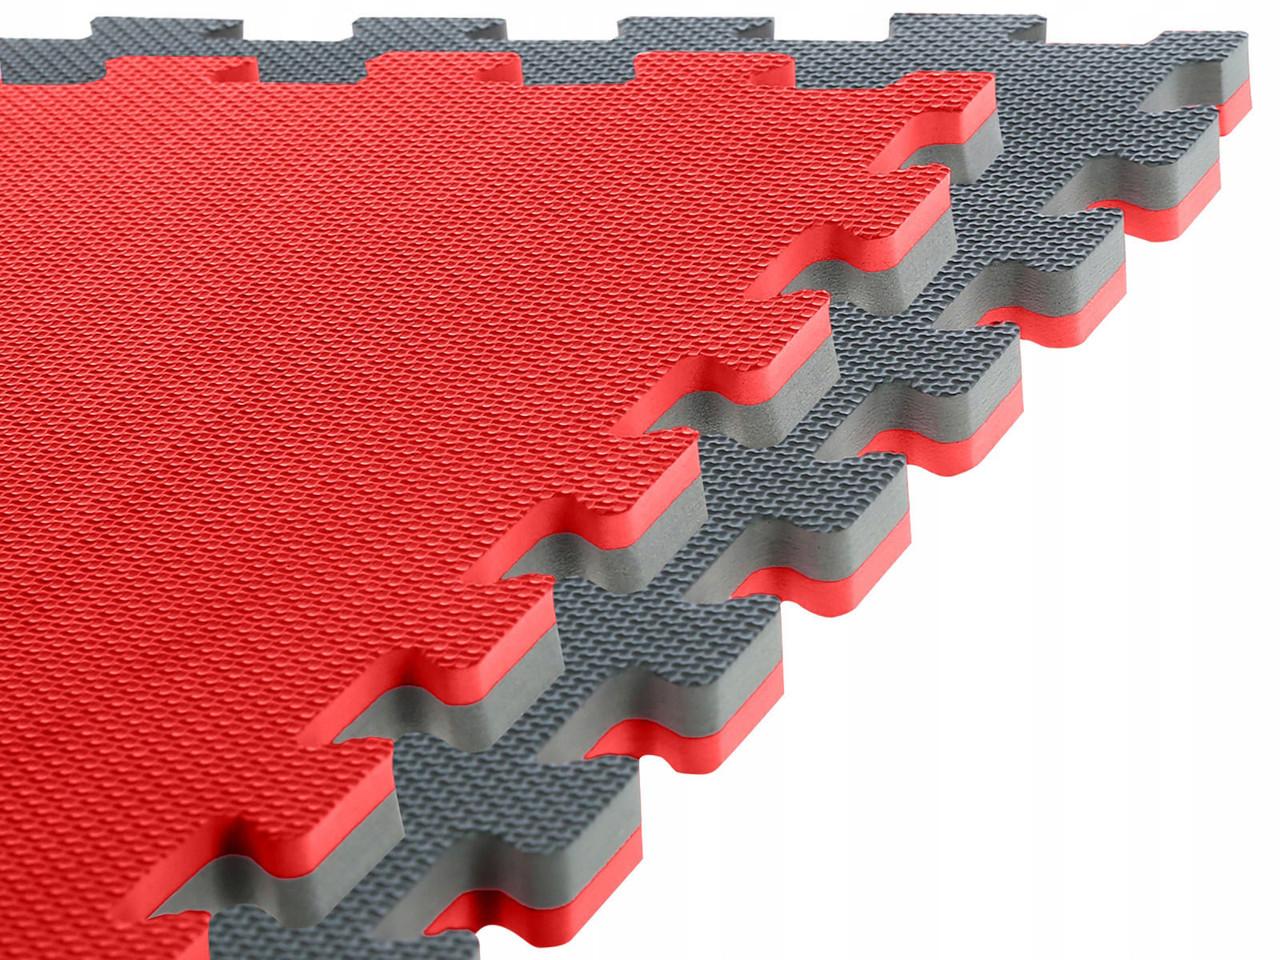 Спортивный мат-татами (ласточкин хвост, пазл) SportVida Mat Puzzle Multicolor 100 x 100 x 2 cм SV-HK0179 Grey/Red